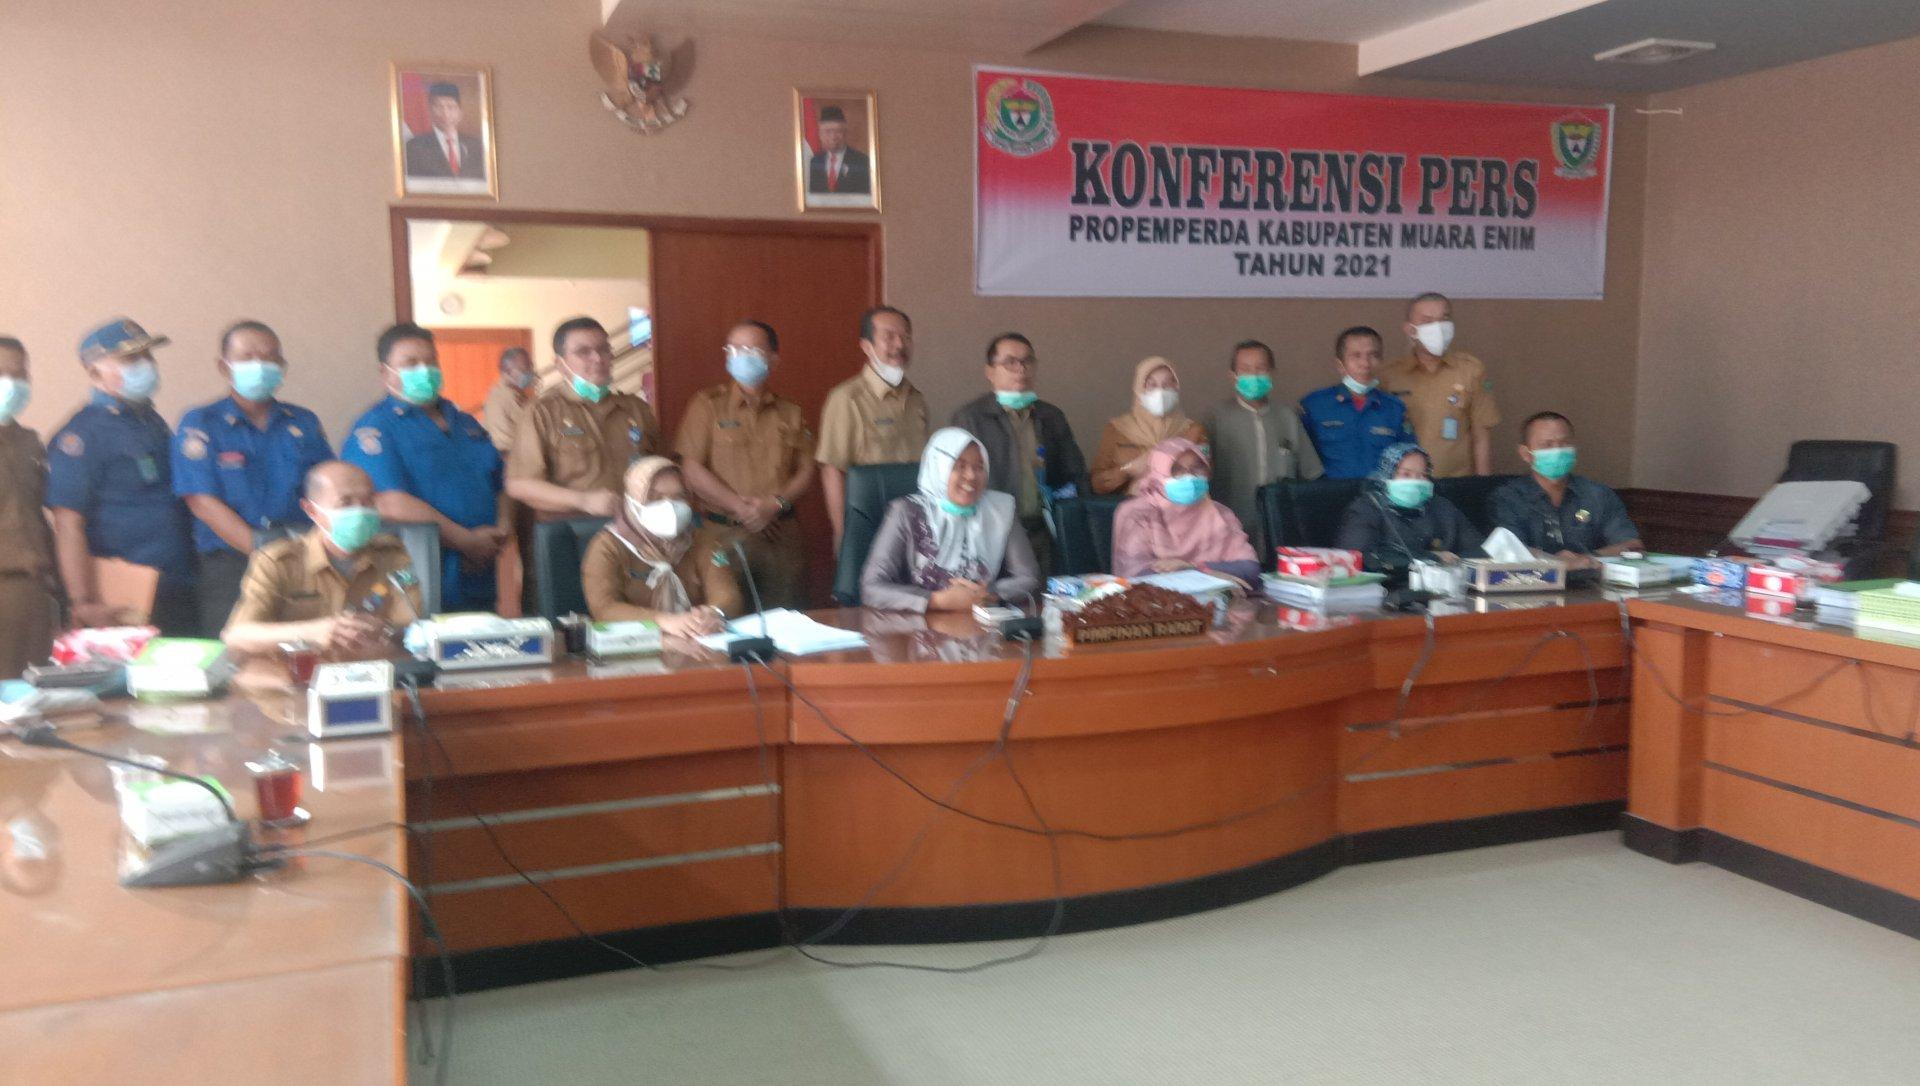 DPRD Bersama Pemkab Muara Enim Sepakati 11 Raperda Dari Eksekutif dan 3 Raperda Inisiatif DPRD